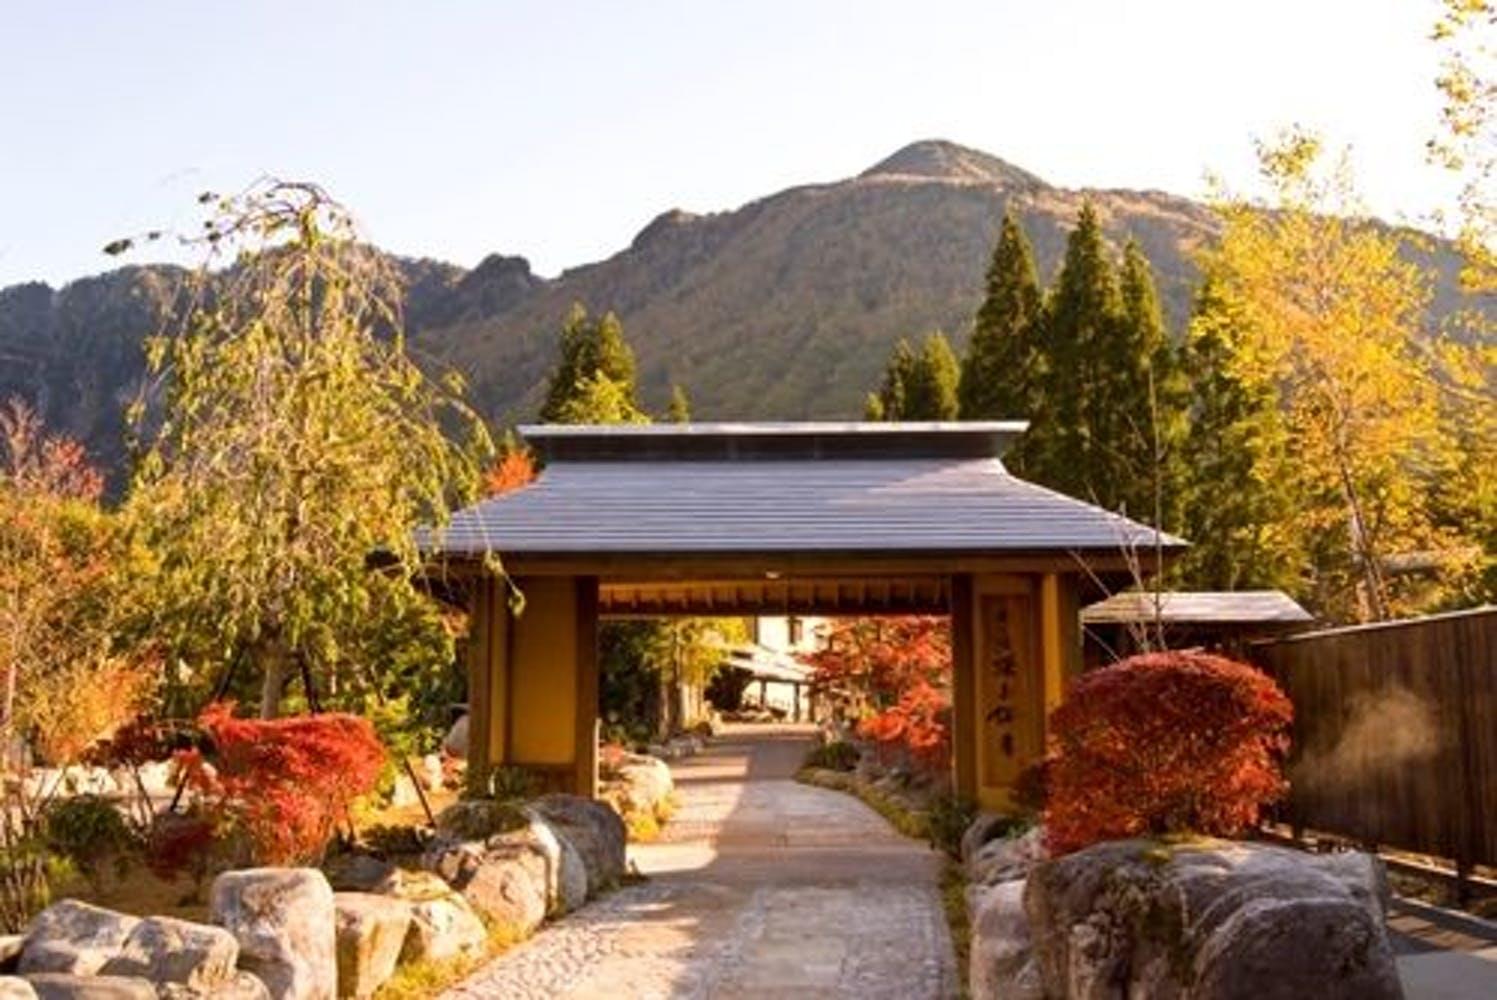 匠の宿 深山桜庵 写真1